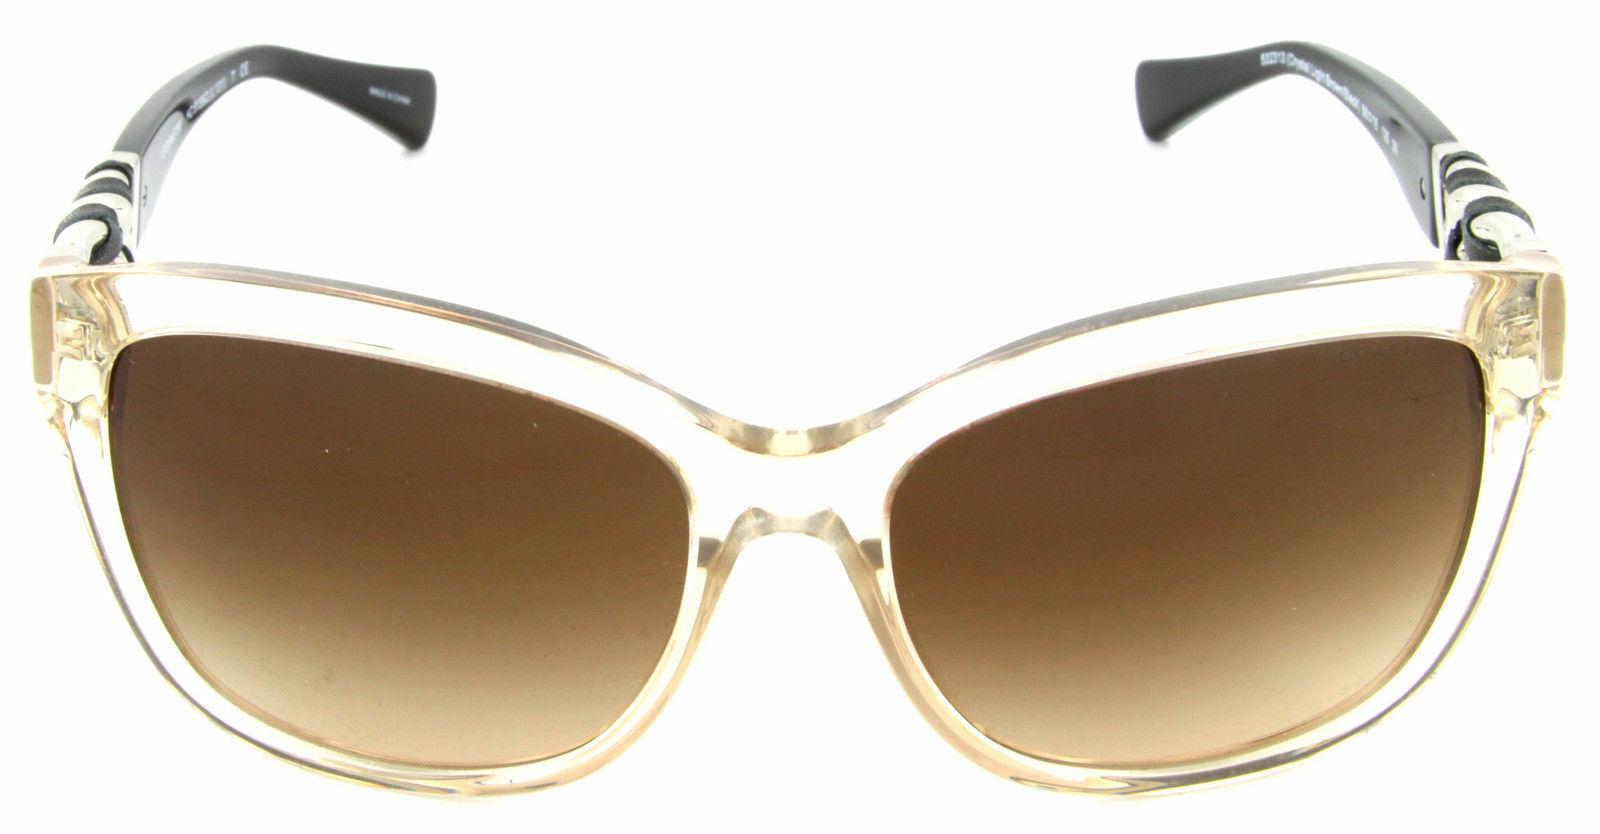 Coach Sunglasses HC8156Q 5323/13 Crystal Light Brown Black / Brown Gradient Lens